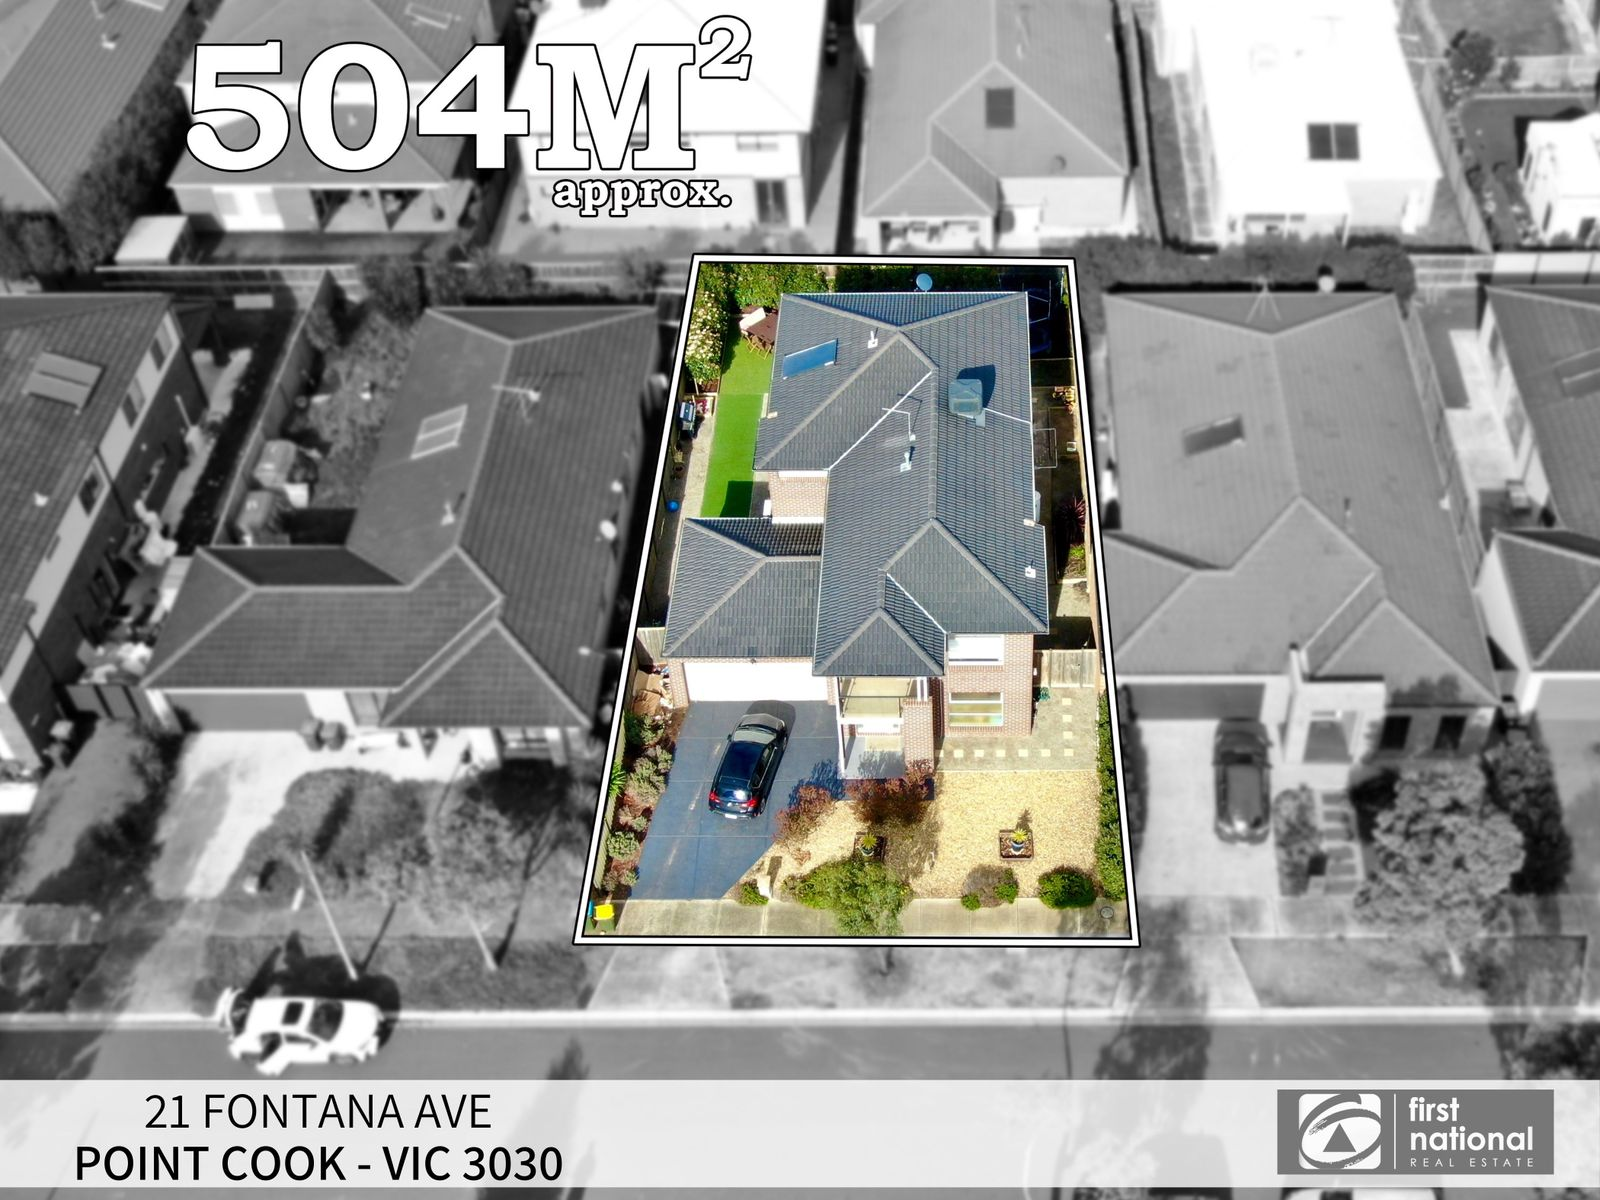 21 Fontana Avenue, Point Cook, VIC 3030